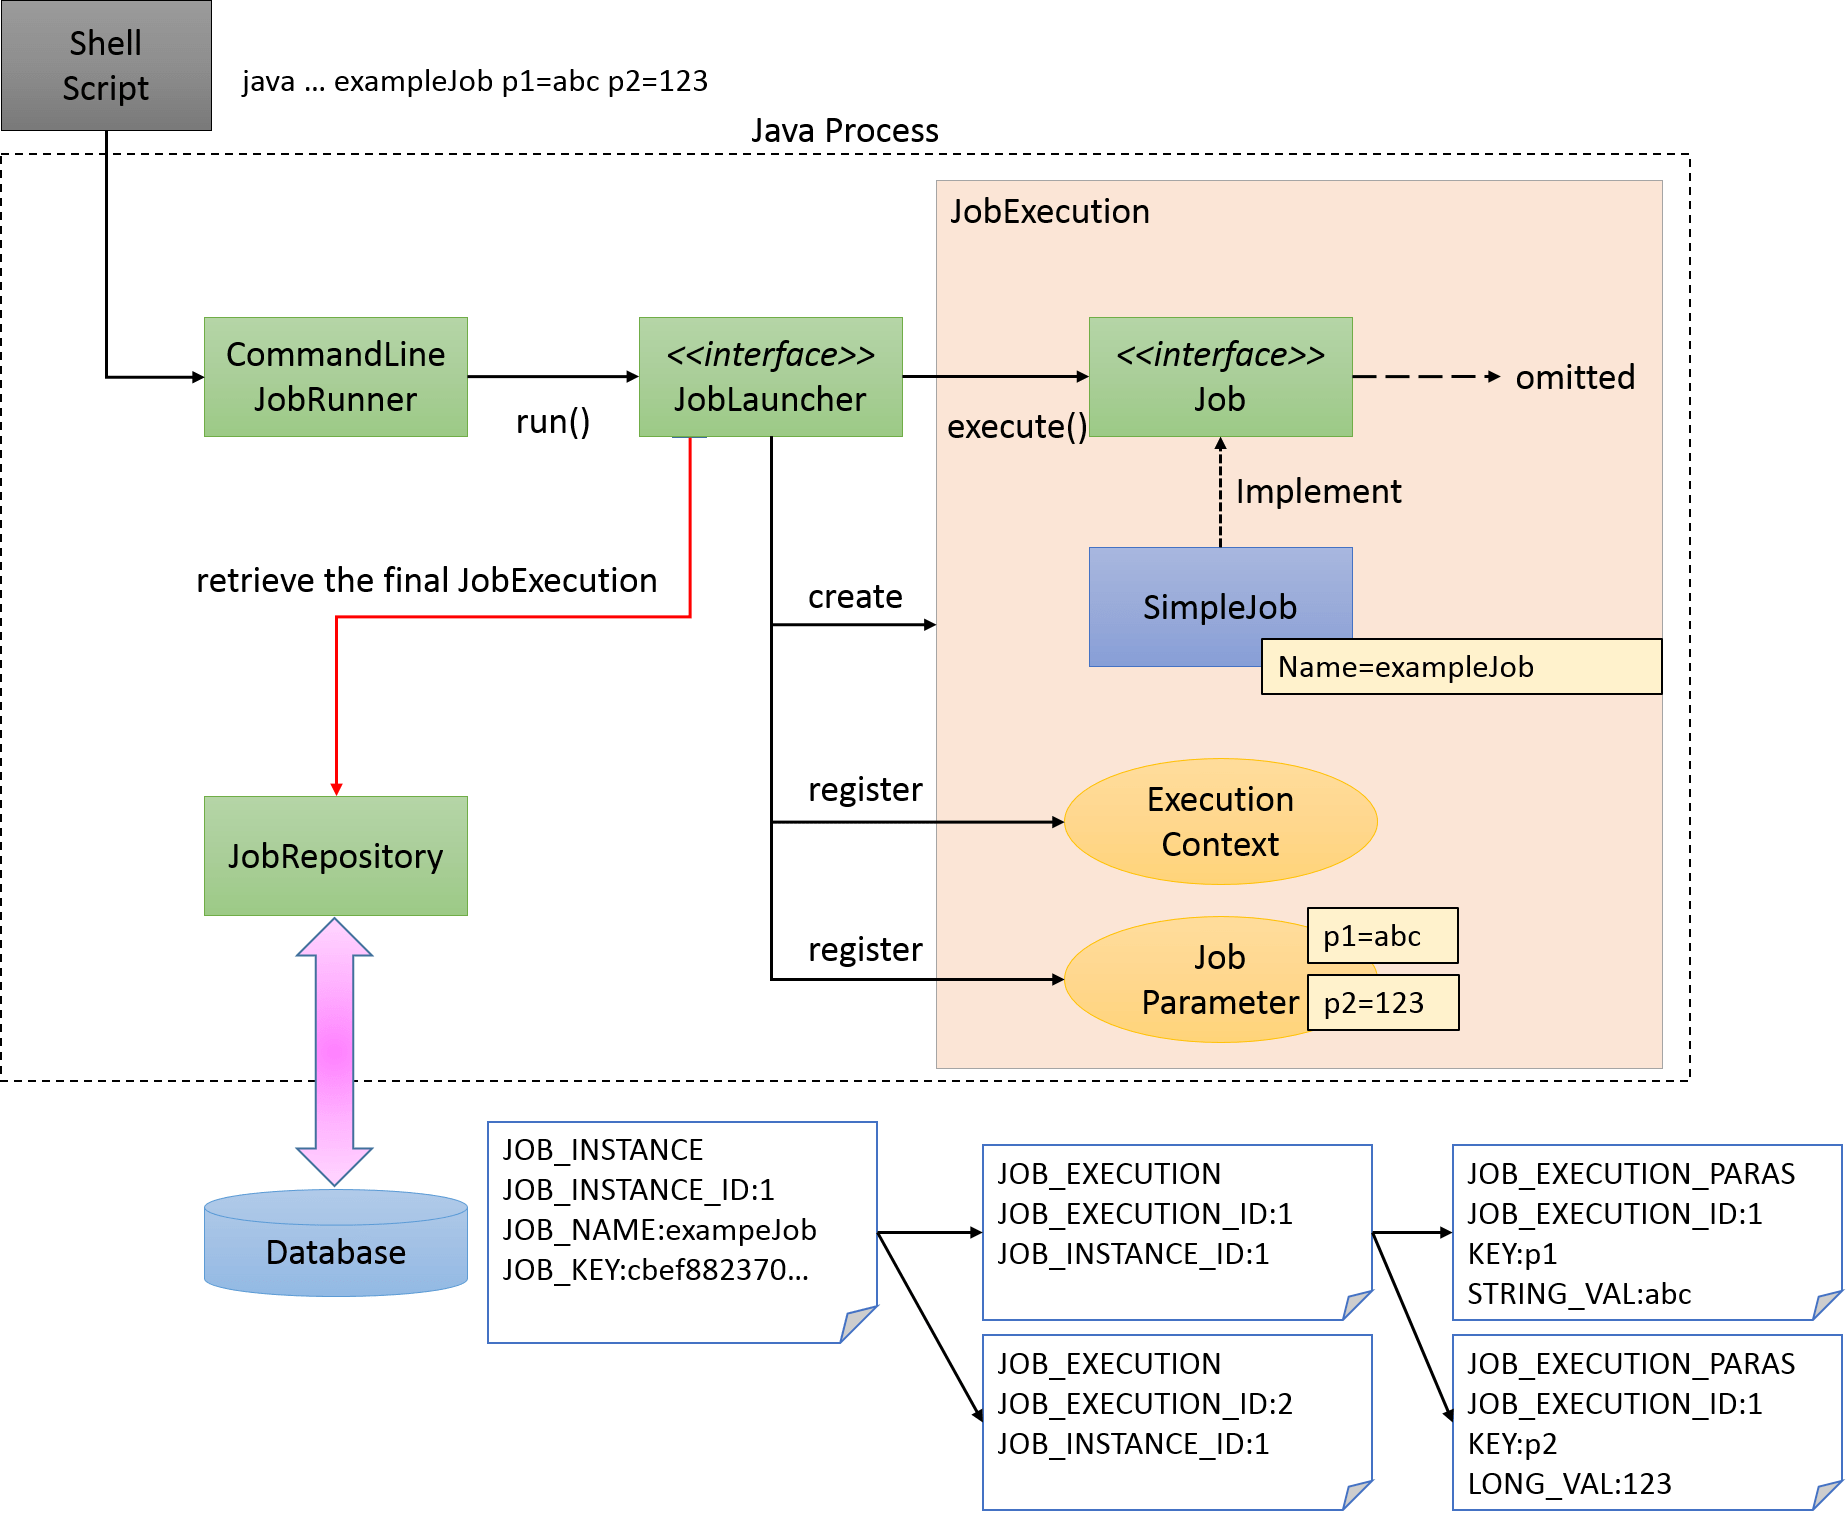 java 3 tier architecture diagram fuse switch wiring process flow schemes